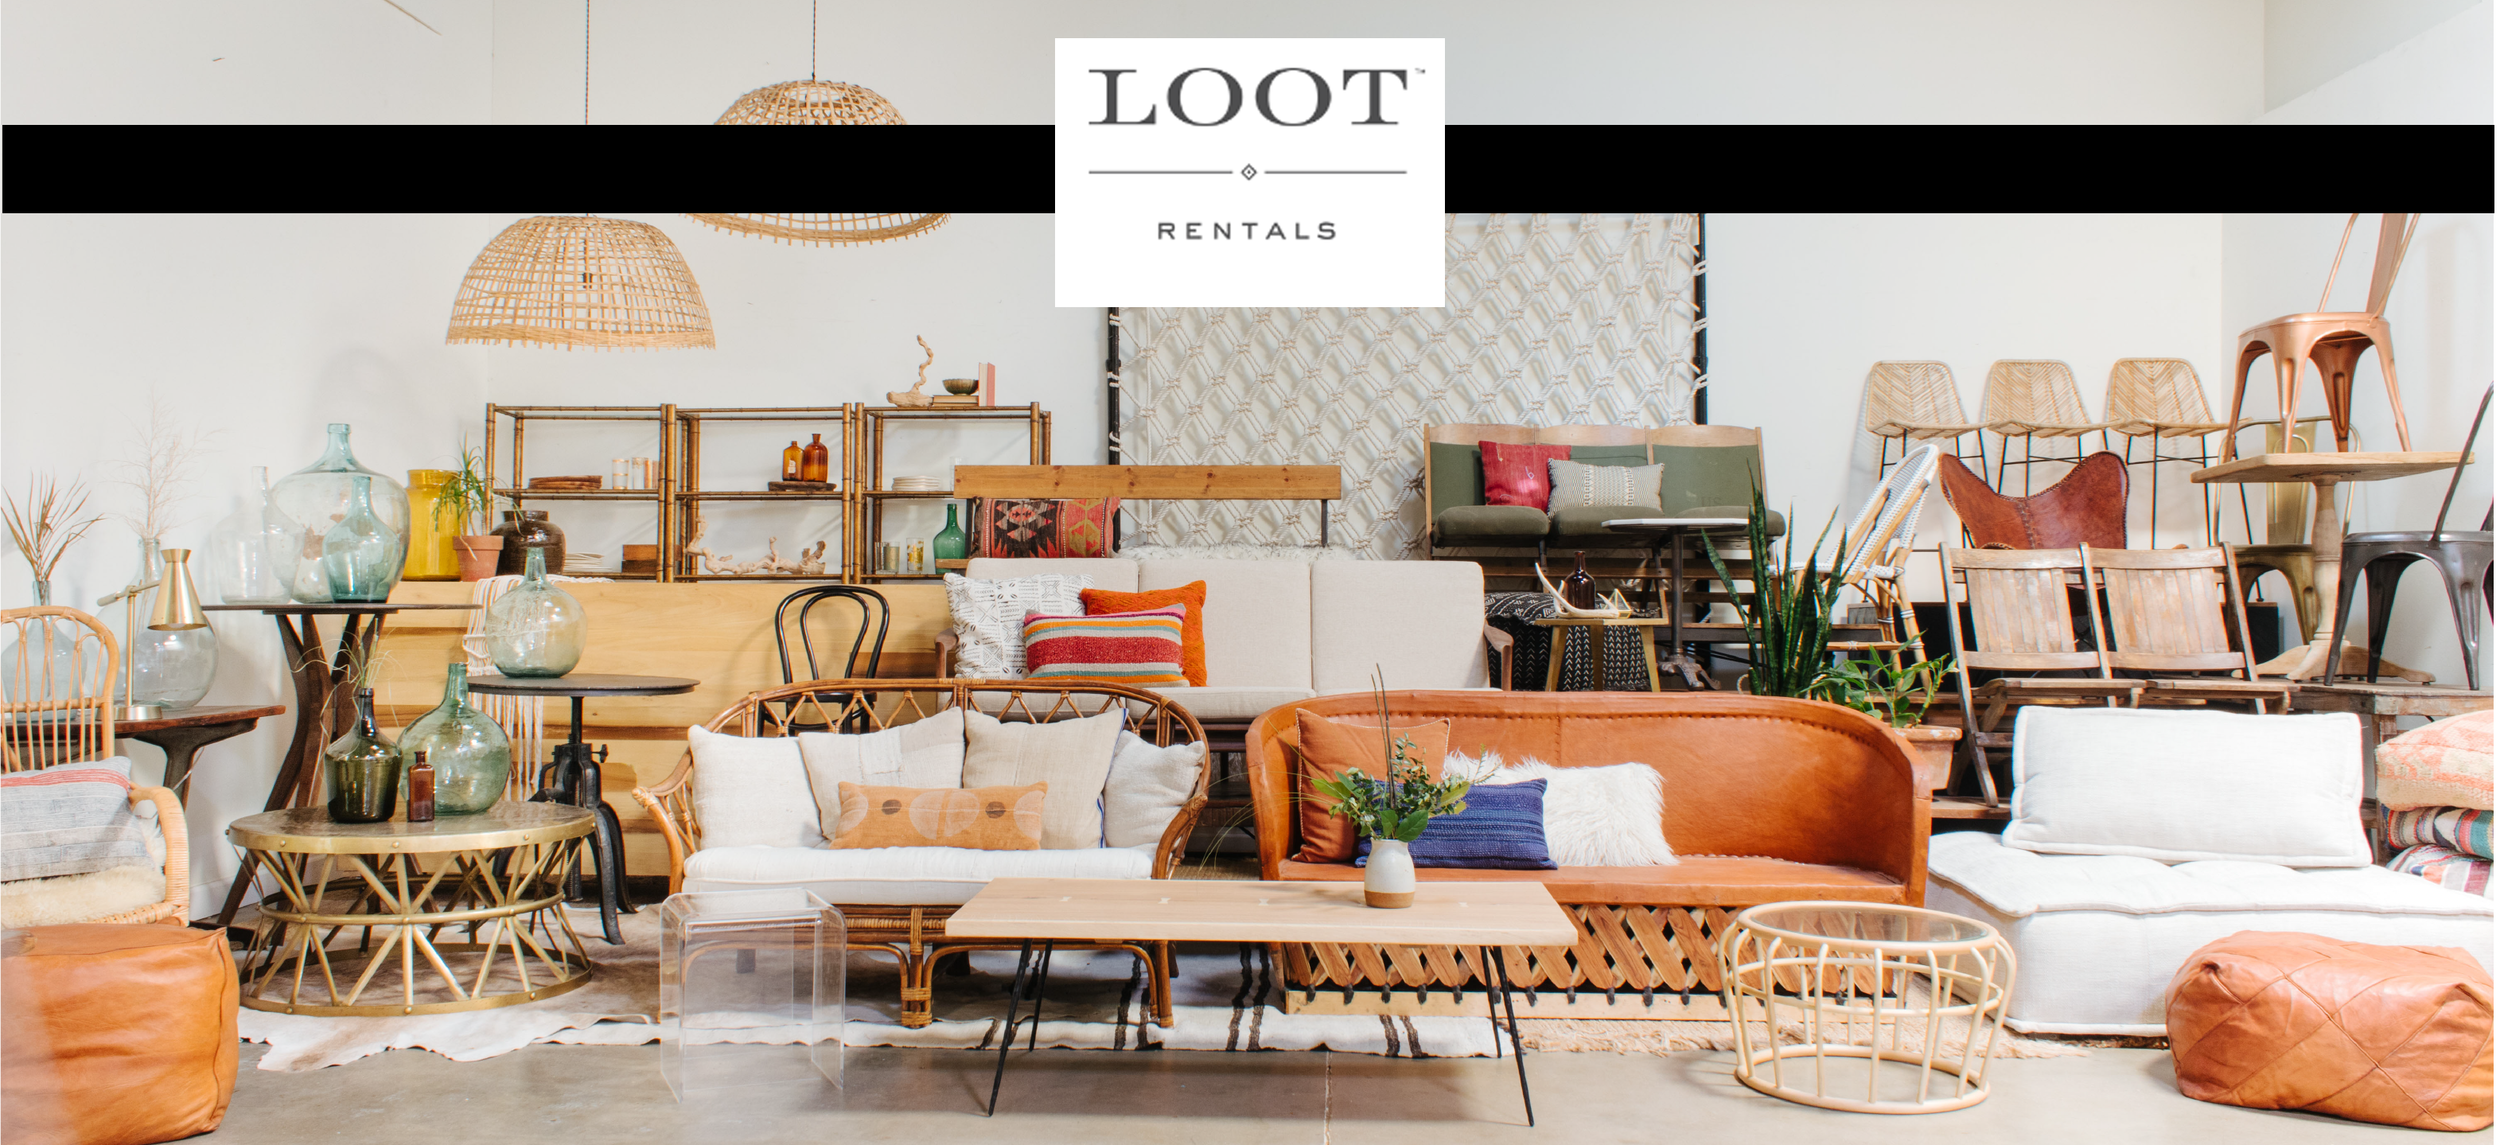 LOOT design vintage rentals